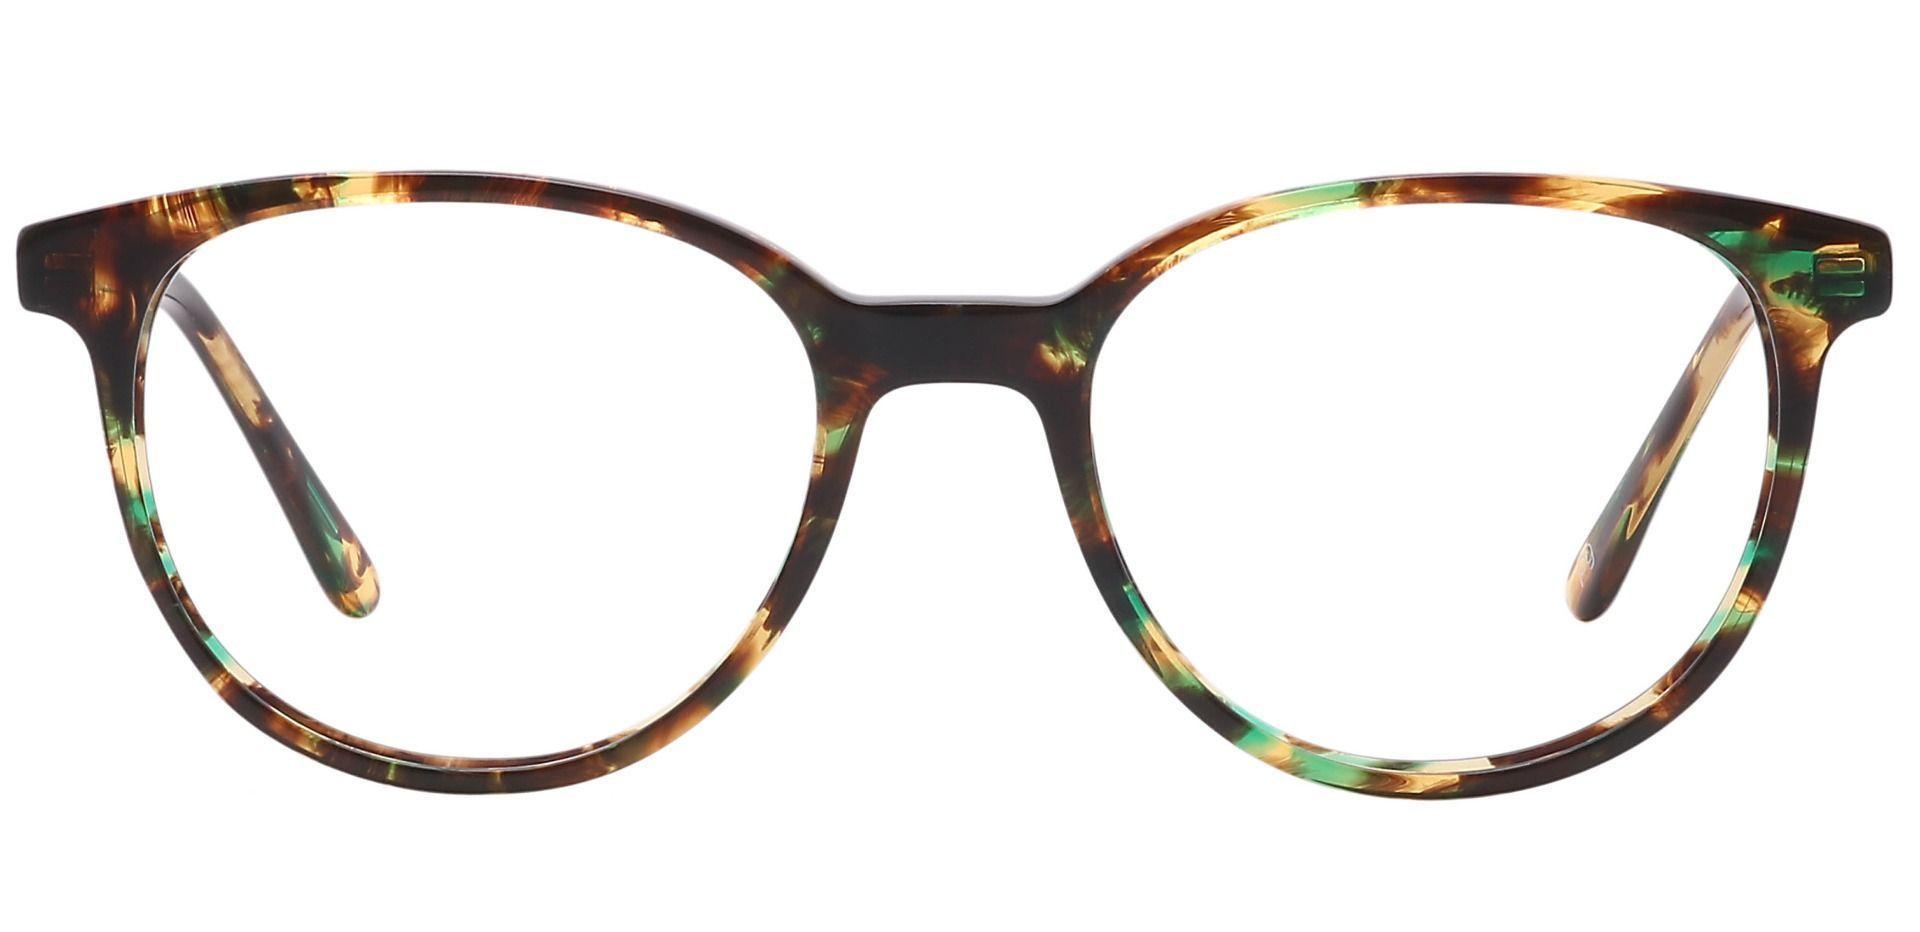 Java Round Prescription Glasses - Green